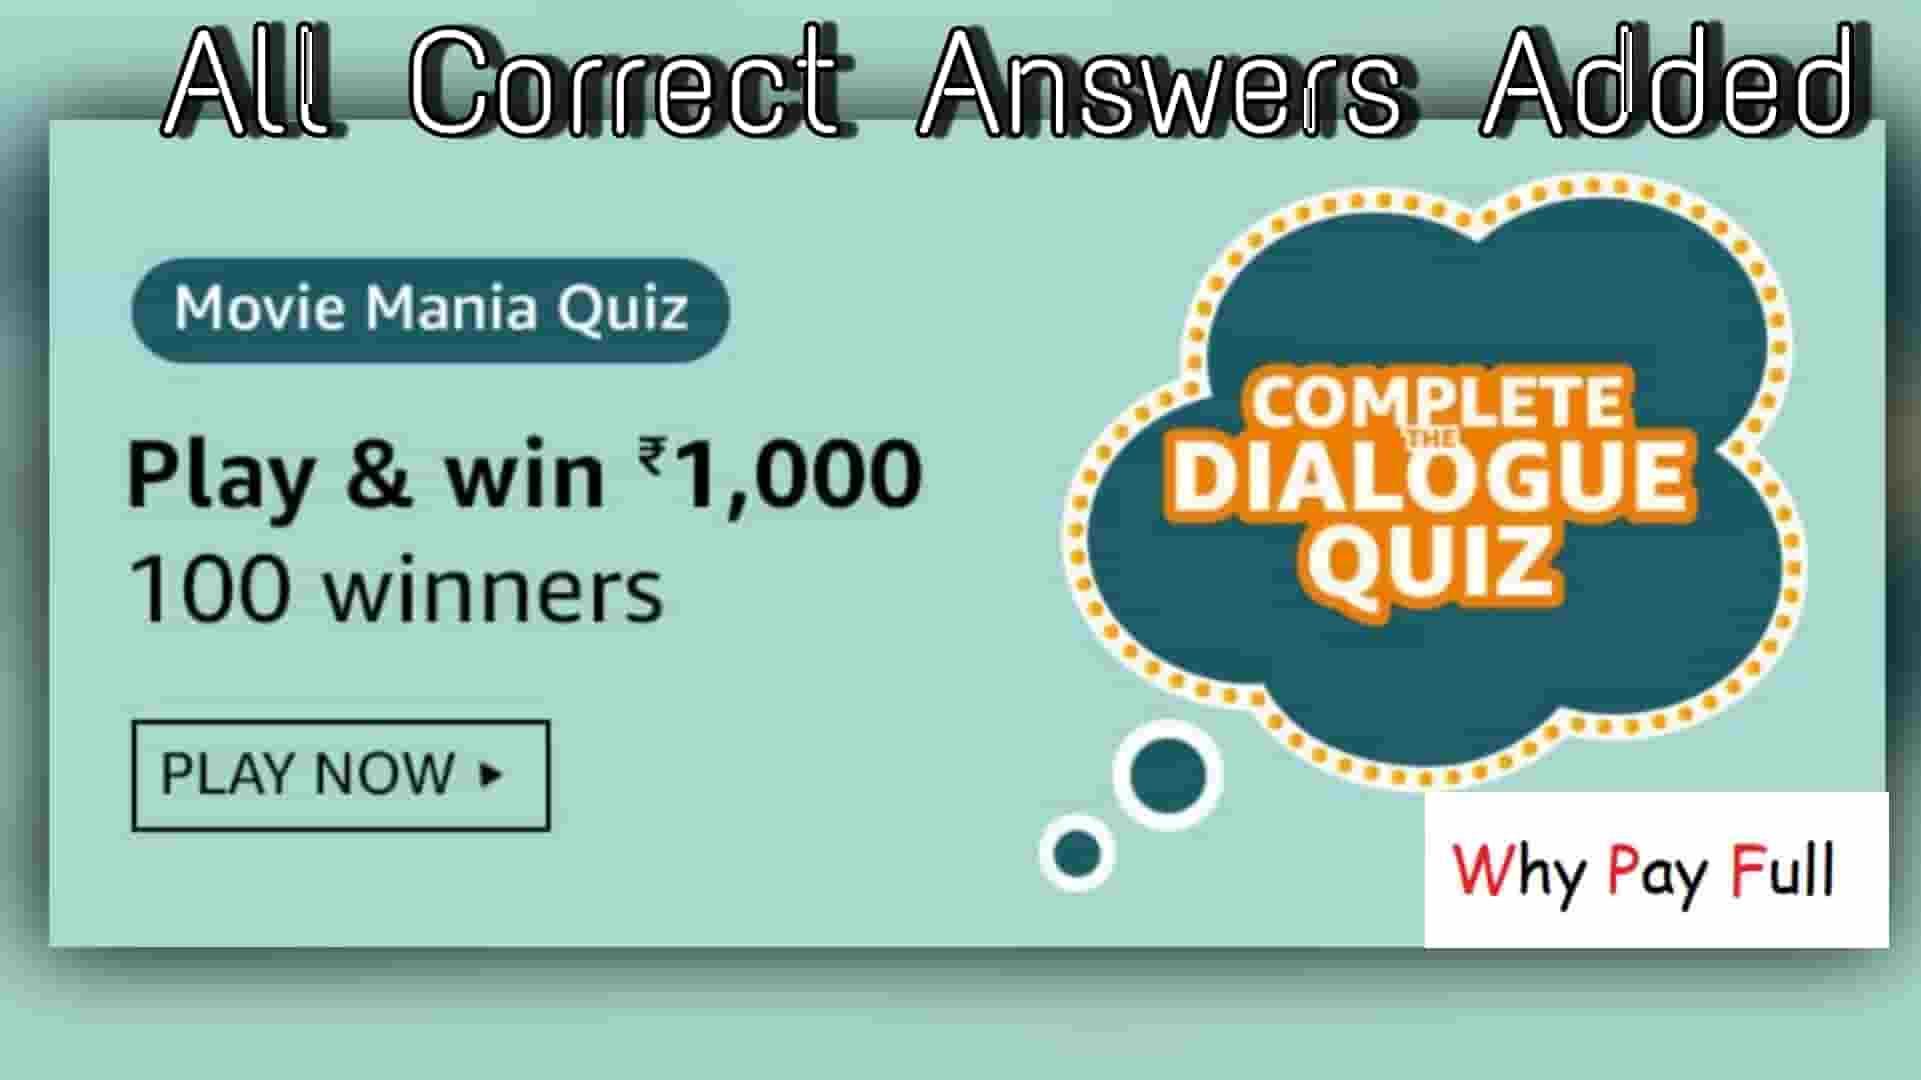 Amazon Dialogue Quiz Answers | Movie Mania Quiz Answers